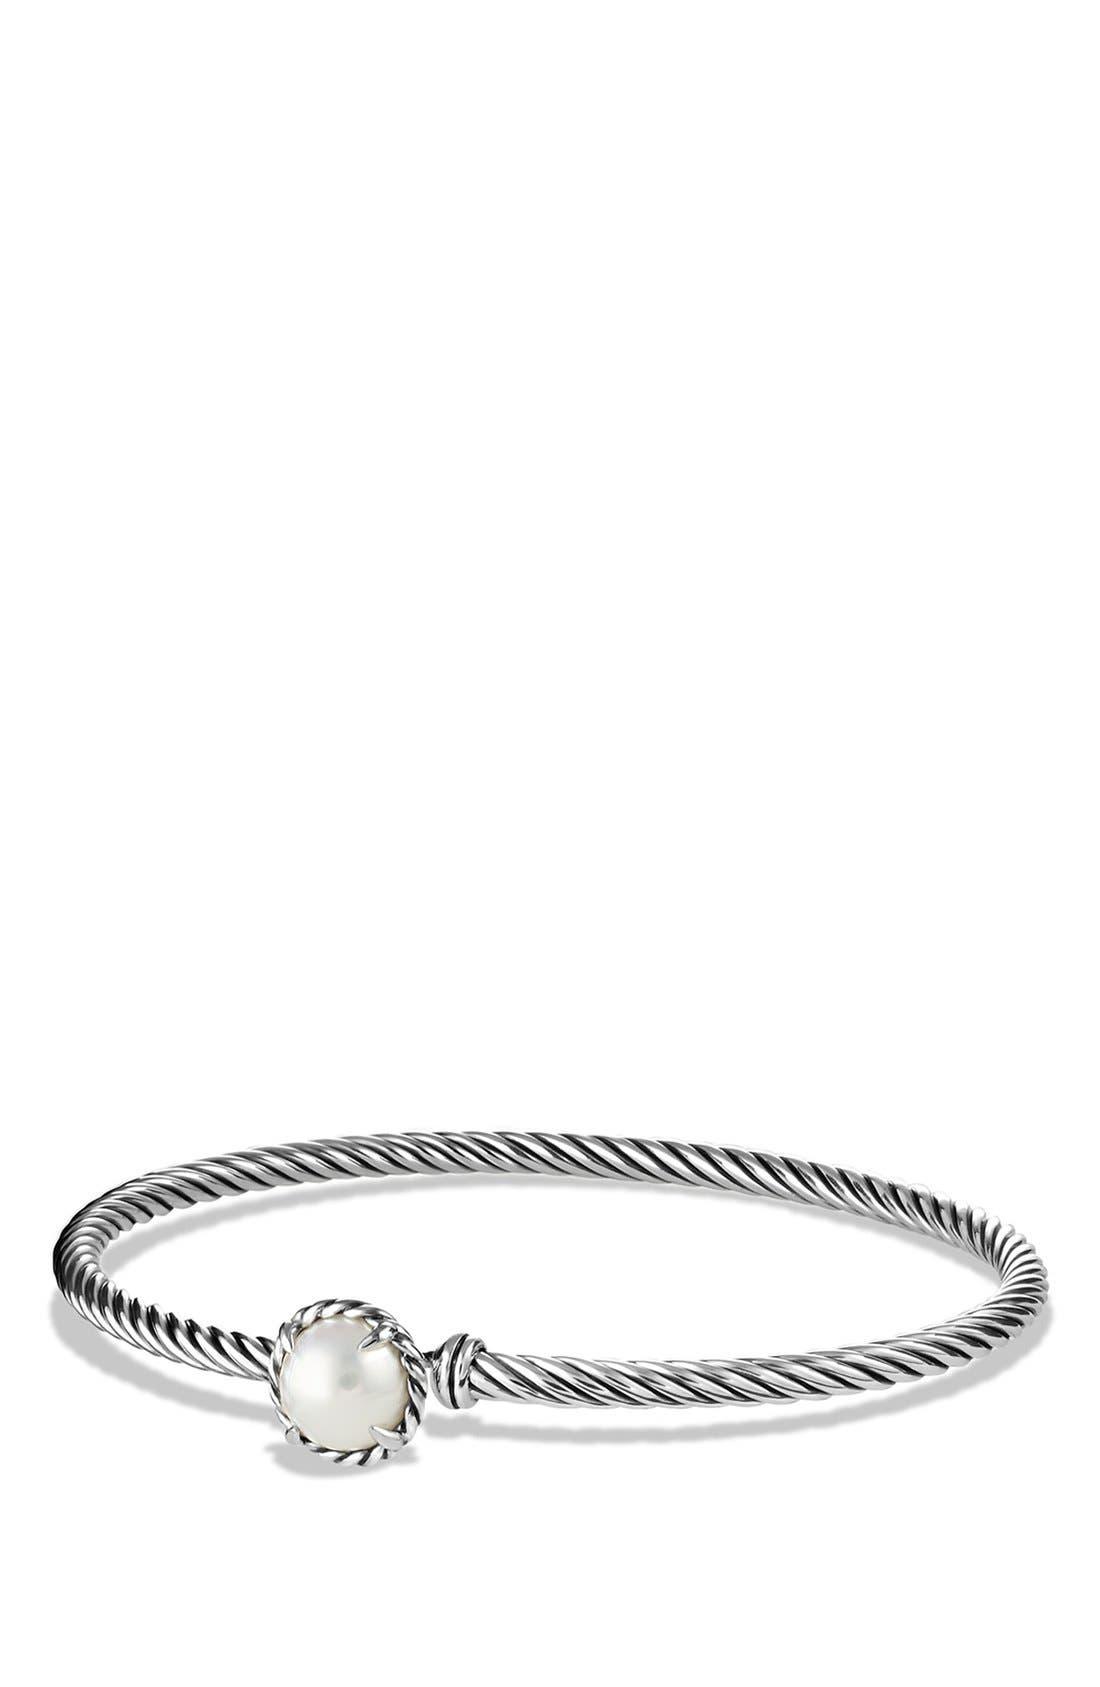 David Yurman 'Color Classics' Bangle Bracelet